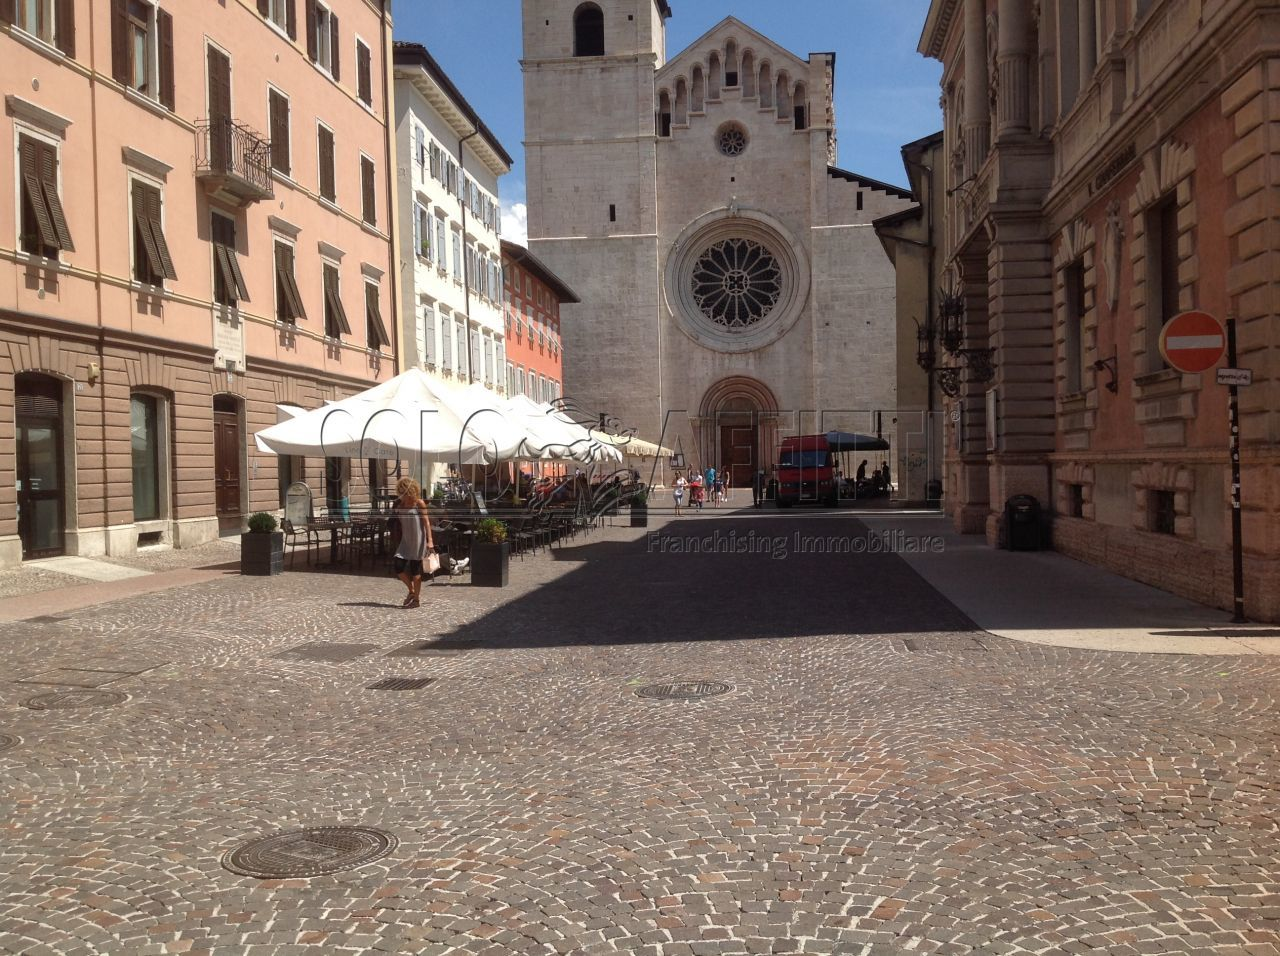 Bilocale Trento Via Don Arcangelo Rizzi 1 1